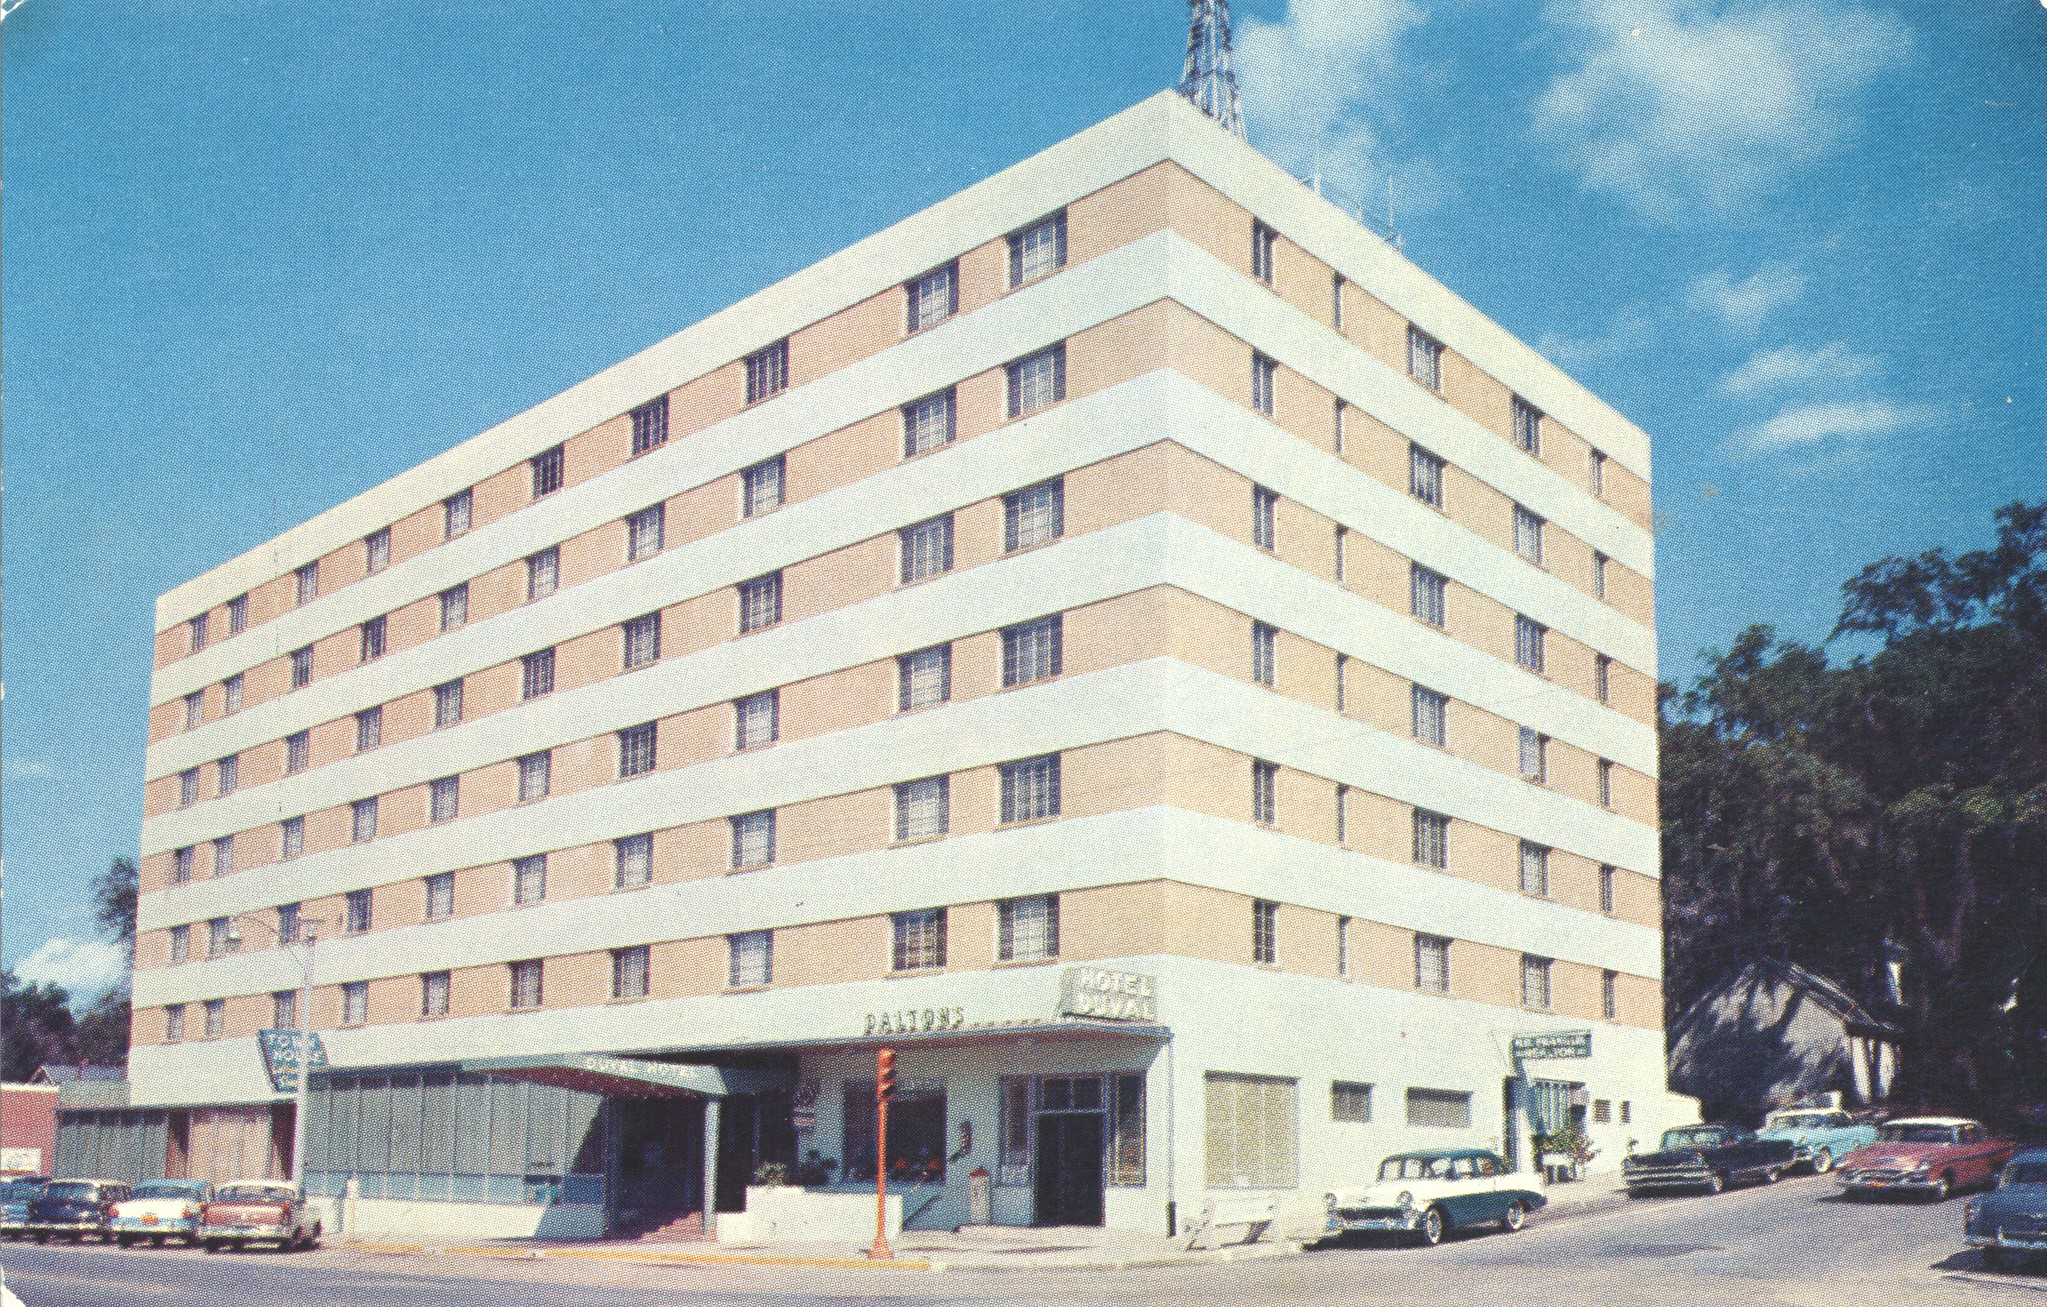 Duval Hotel - Tallahassee, Florida